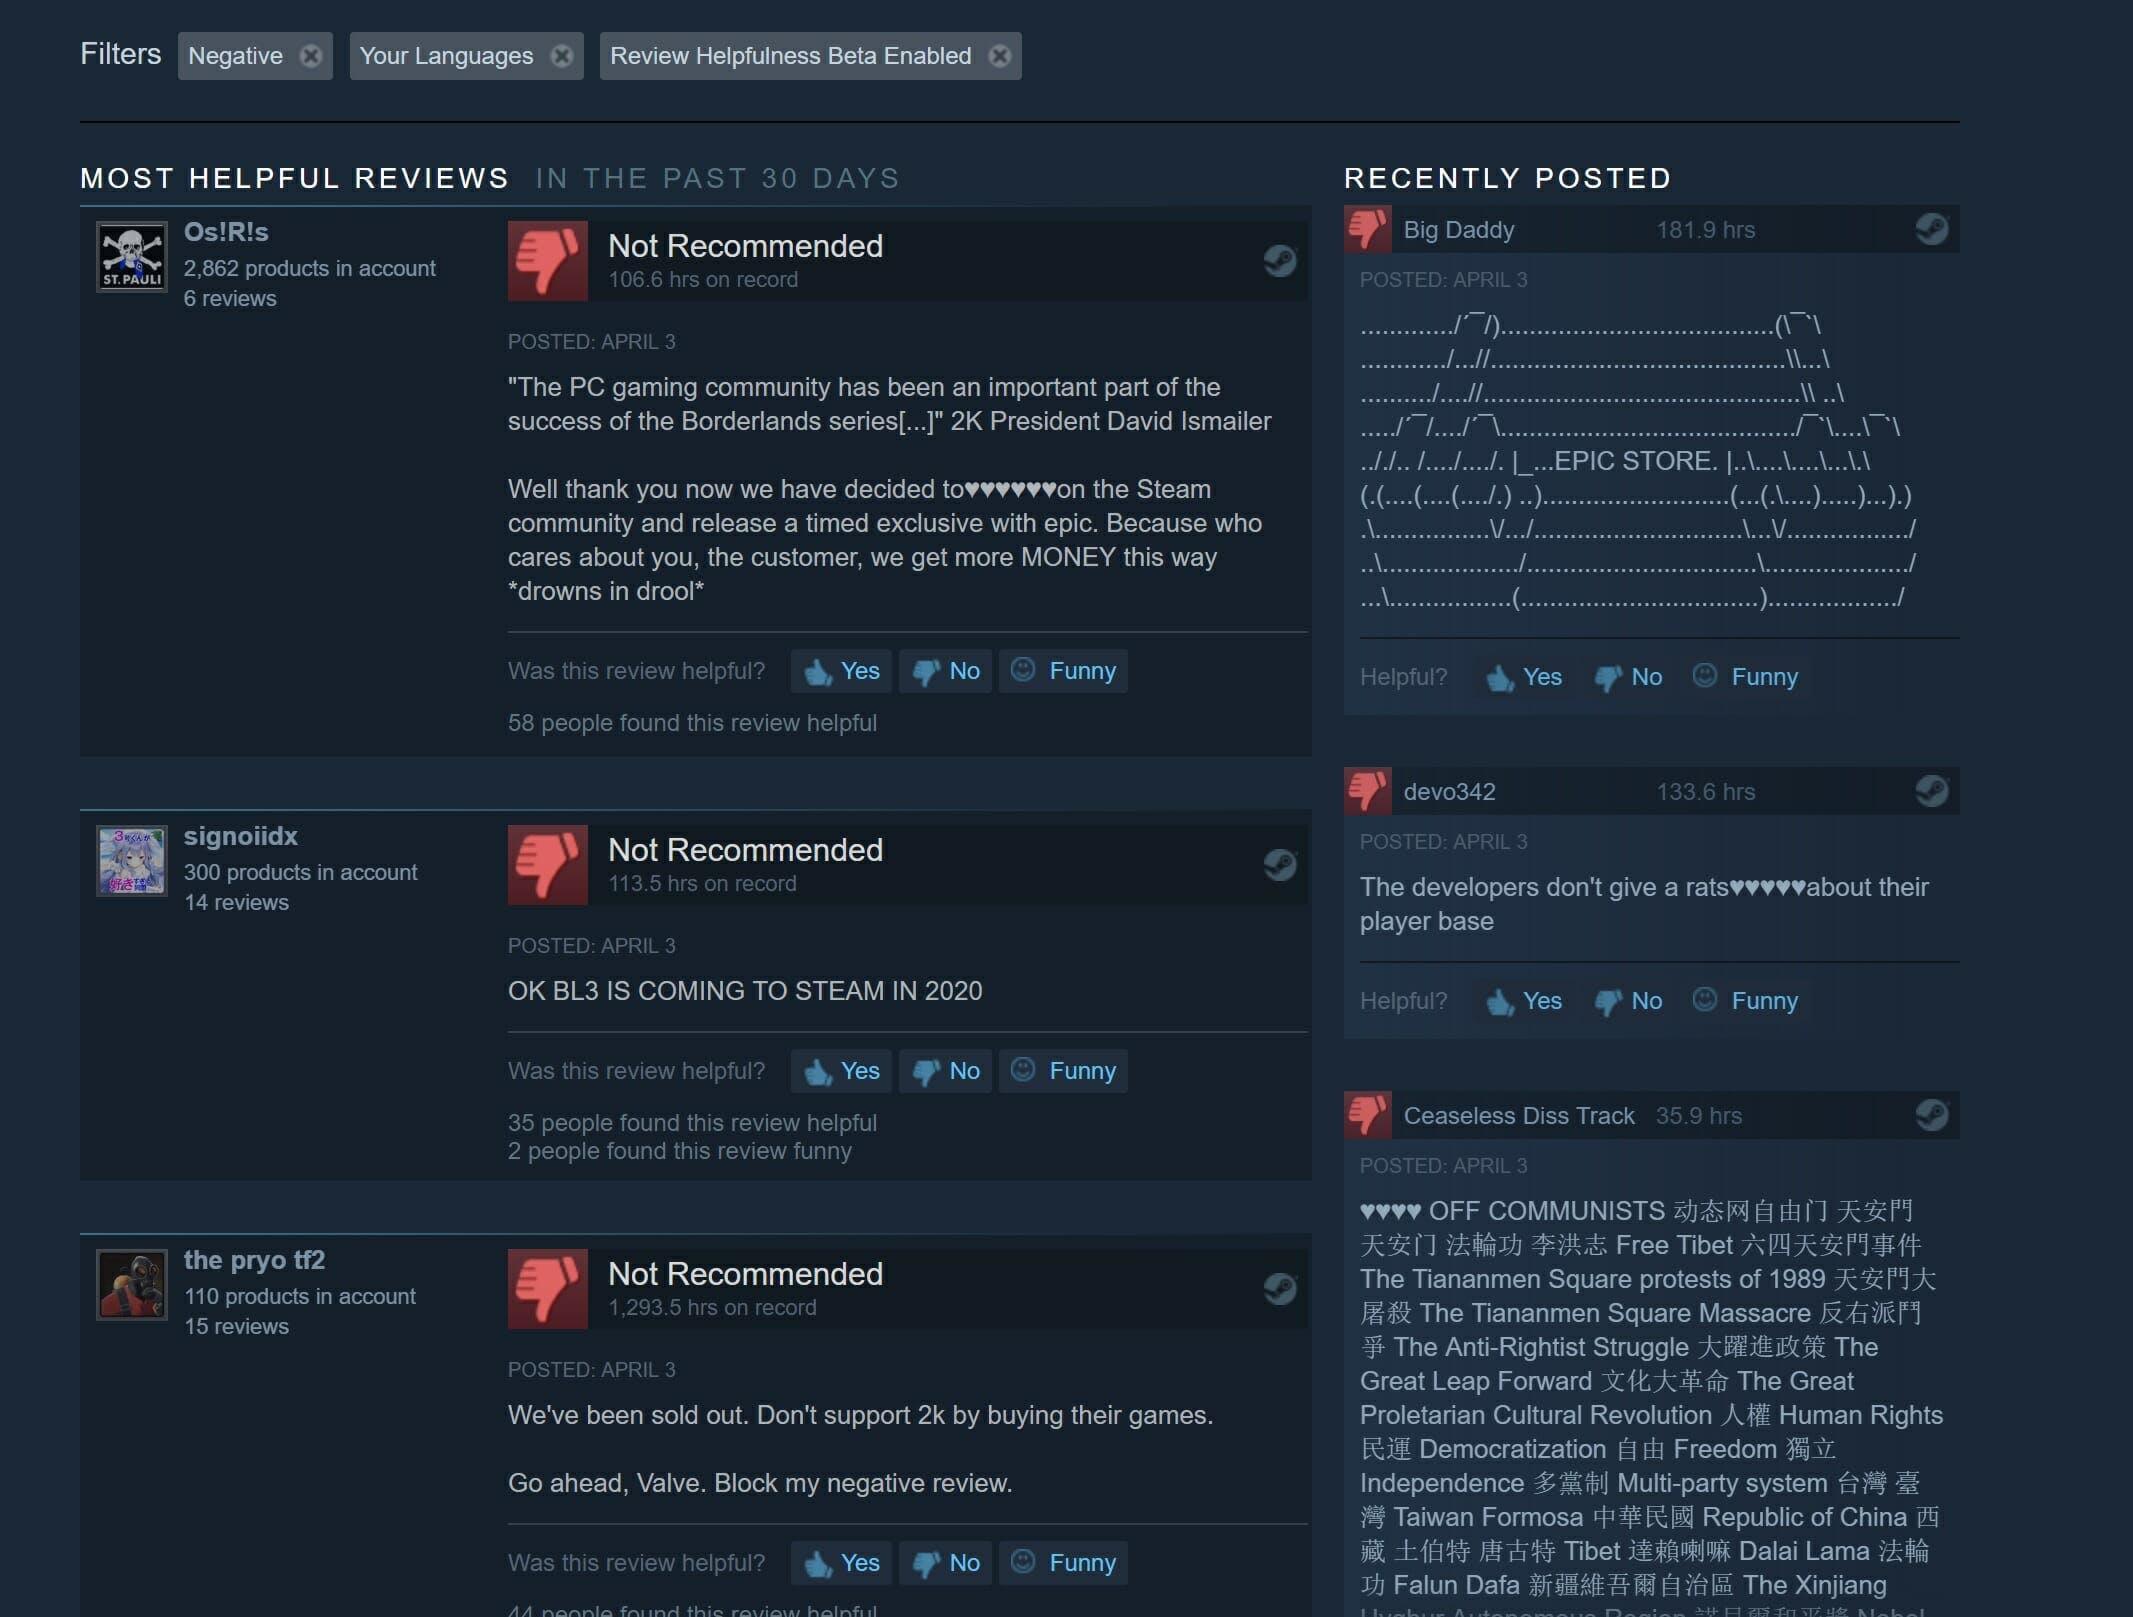 borderlands 3 epic games store review bomb